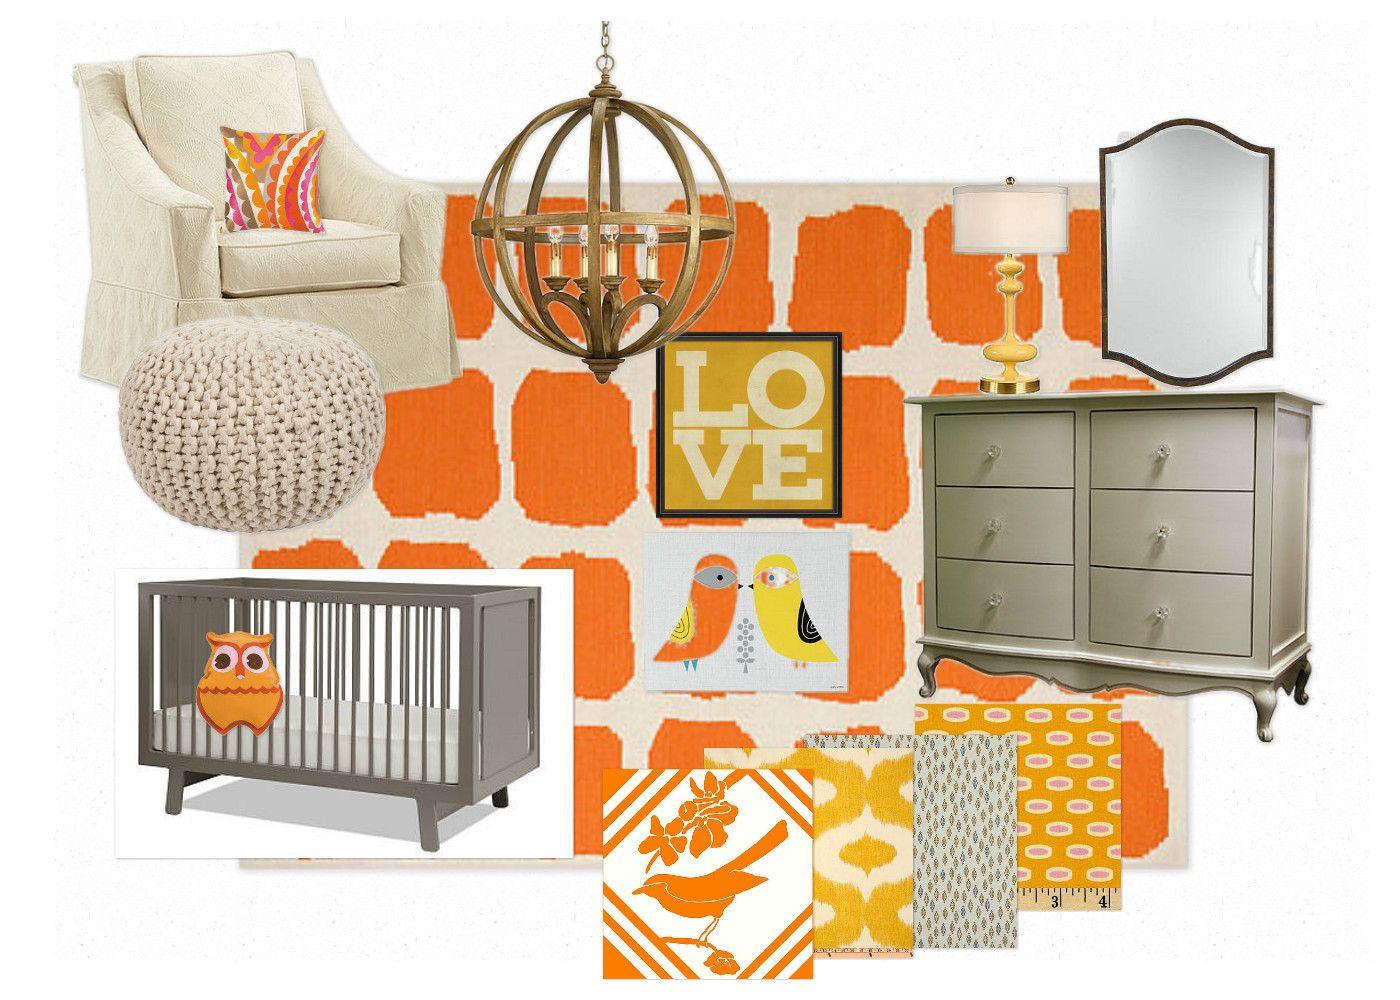 adorned abode: Bright and cheery gender neutral nursery  #genderneutralnursery #orangeandgraynursery #nurserymoodboard #brightandcheerynursery #colorfulnursery